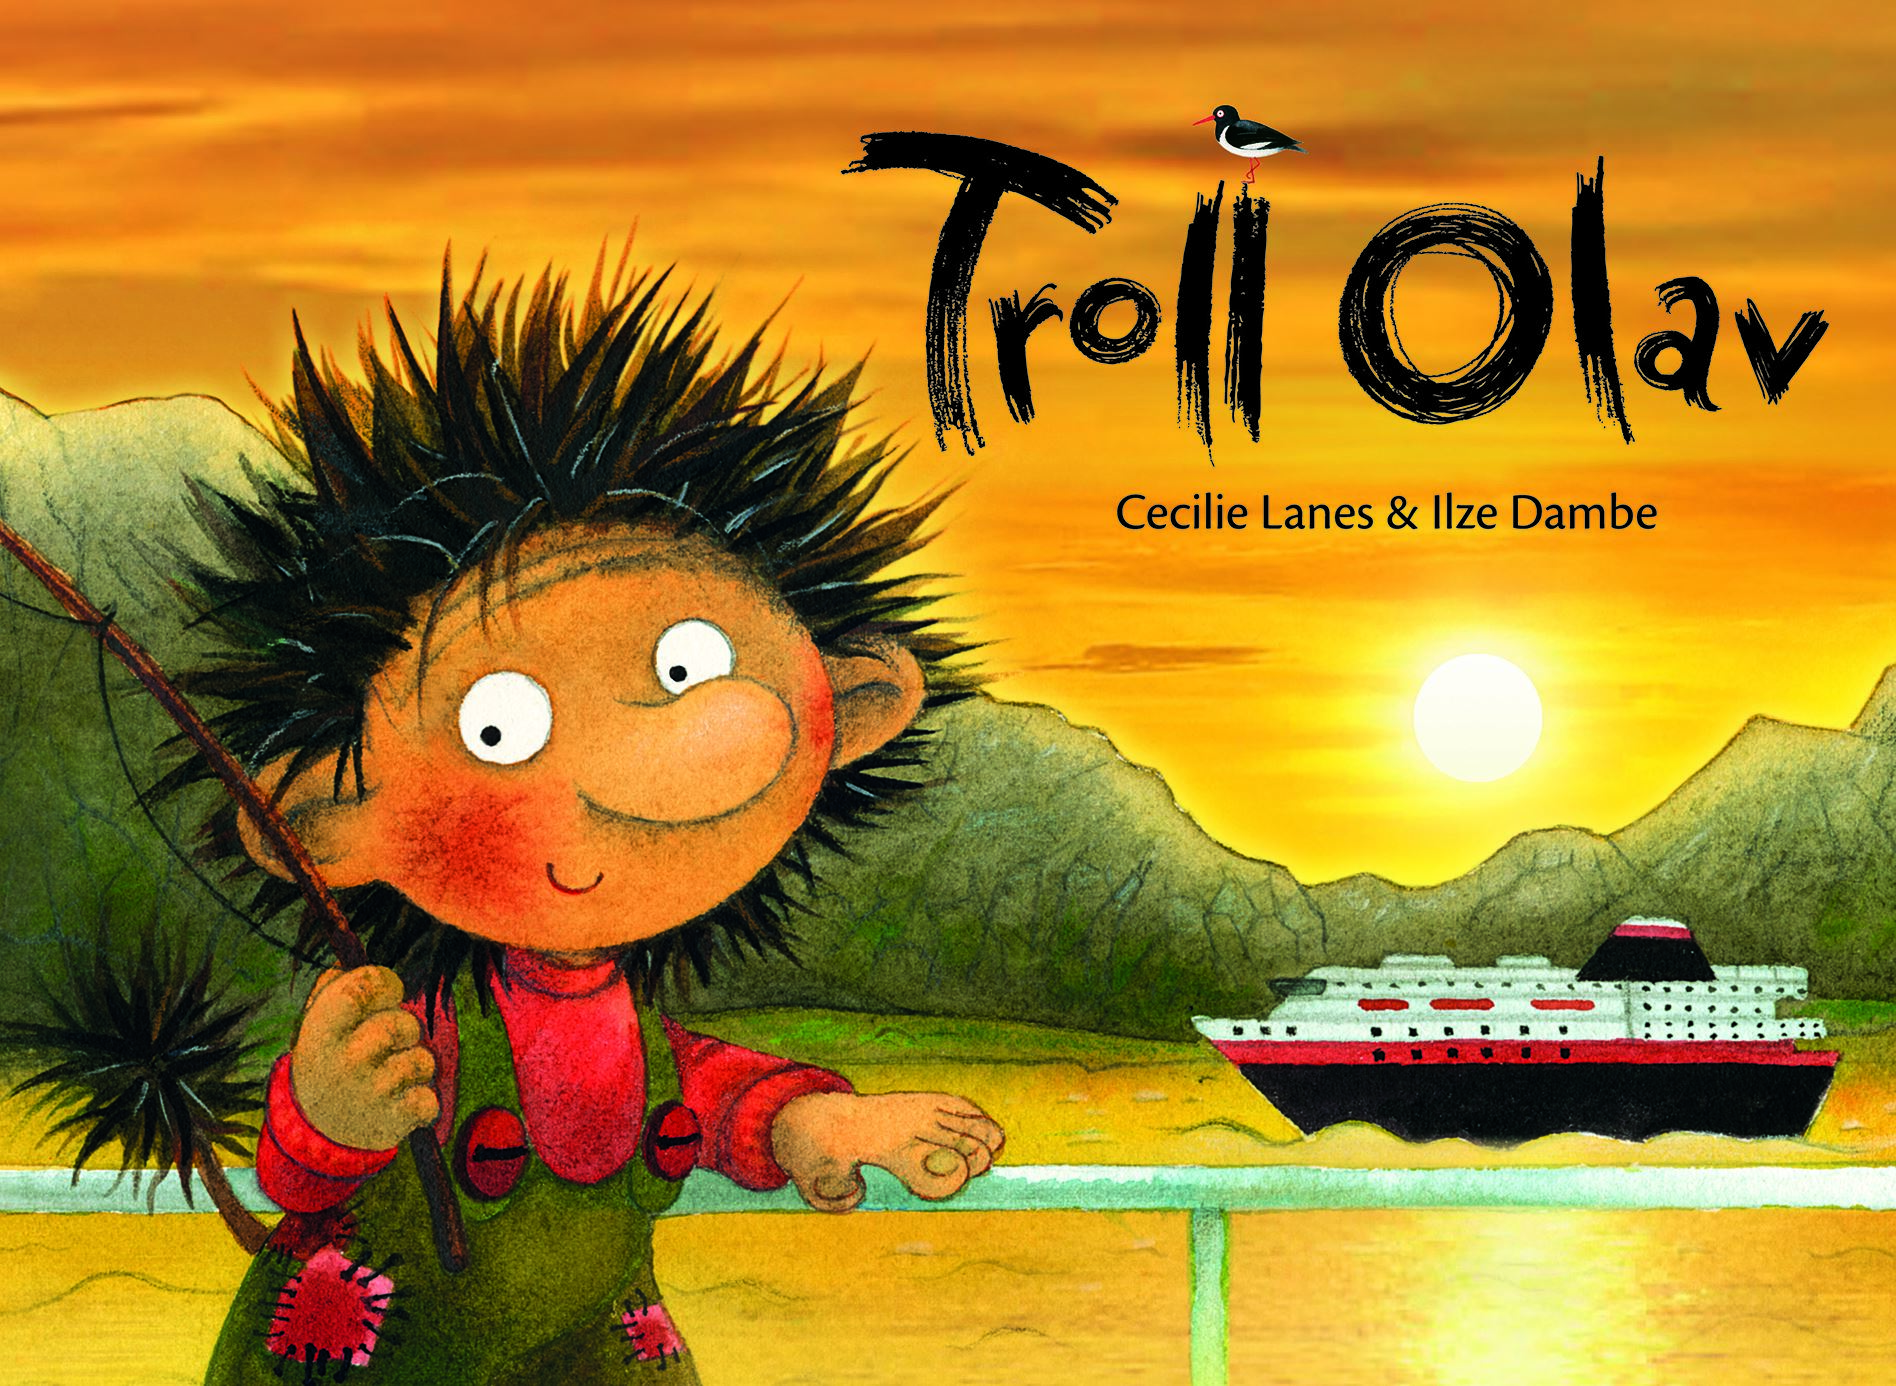 Troll Olav på italiensk